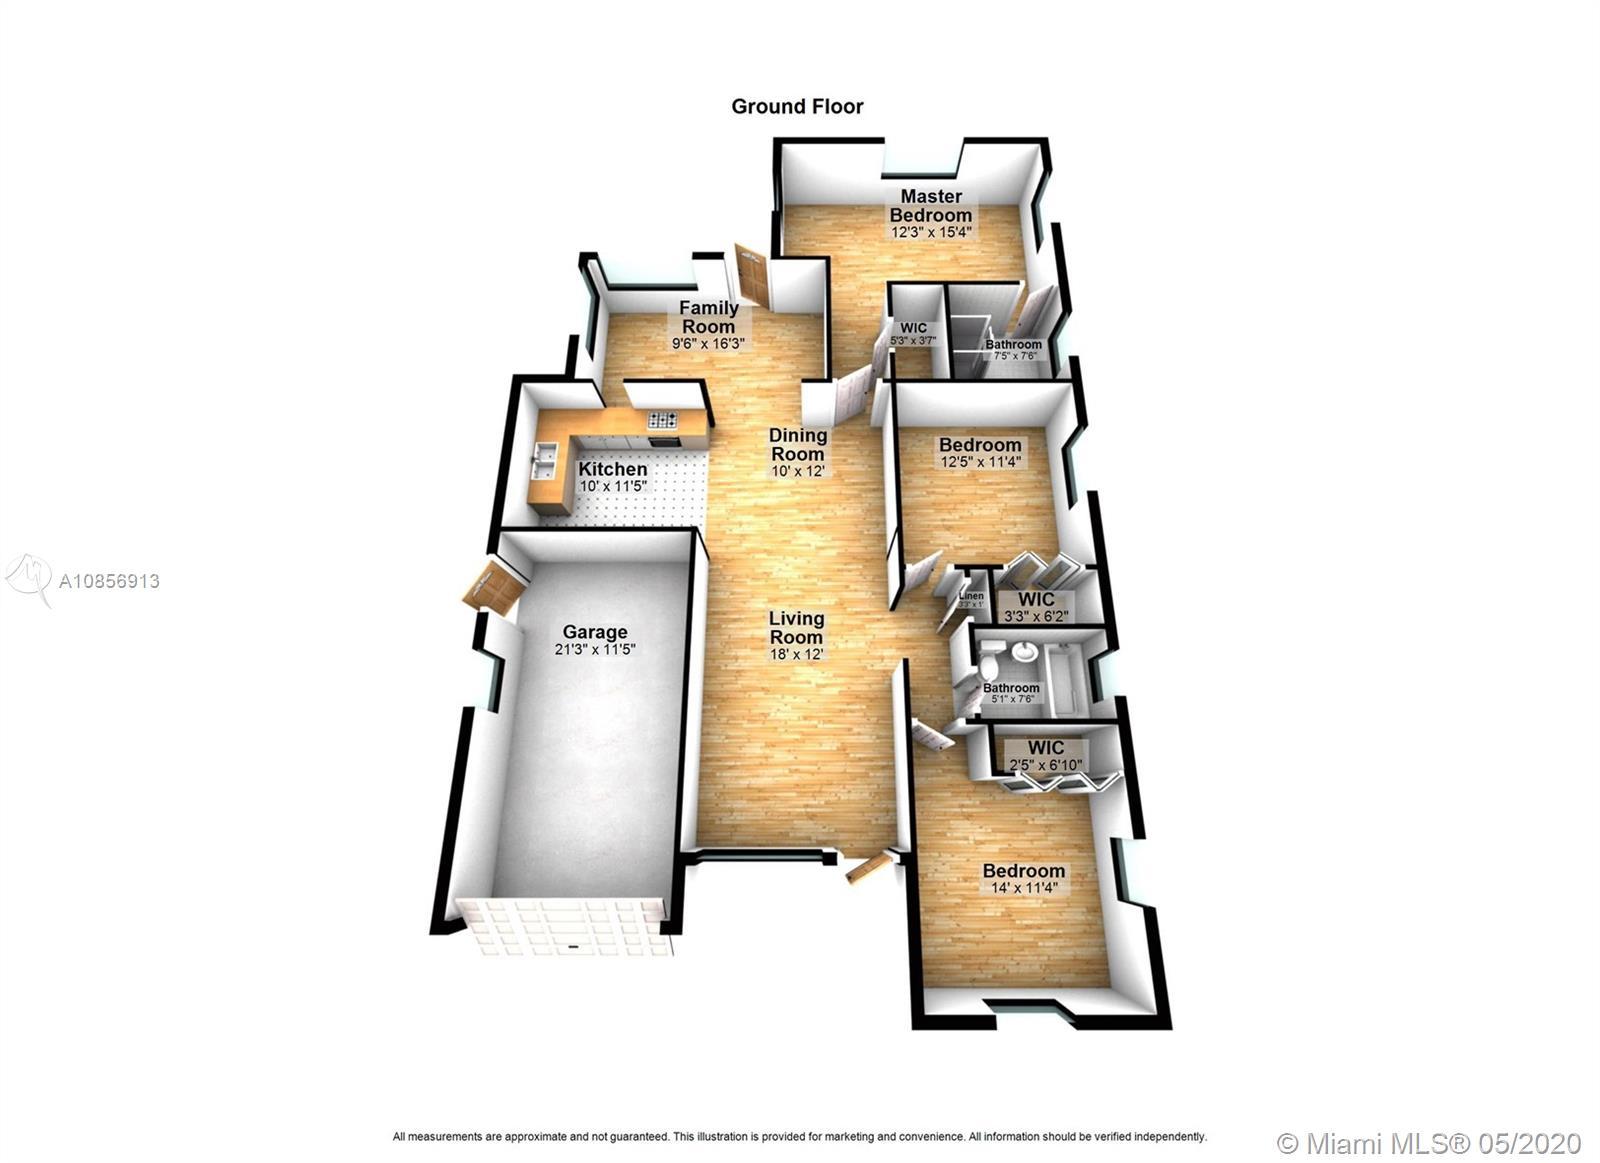 1525 Venetia Ave, Coral Gables, Florida 33134, 3 Bedrooms Bedrooms, ,2 BathroomsBathrooms,Residential,For Sale,1525 Venetia Ave,A10856913